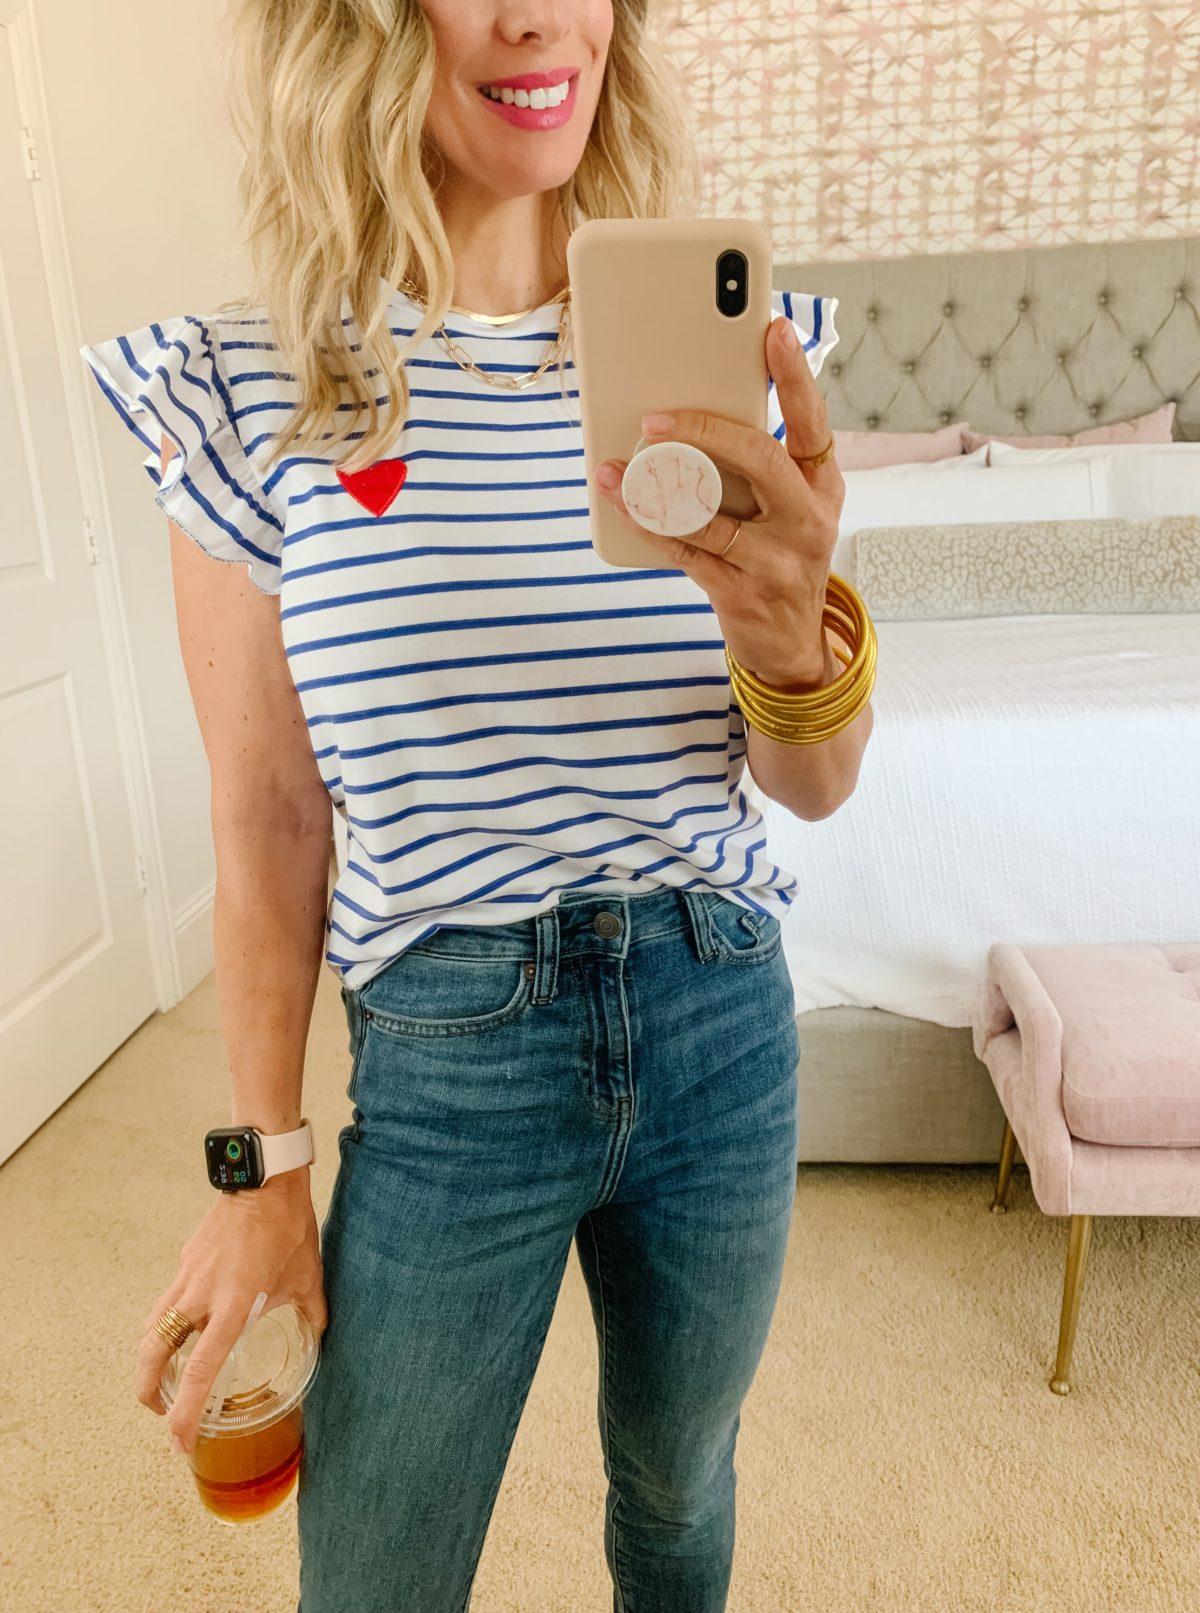 Amazon fashion - women striped top